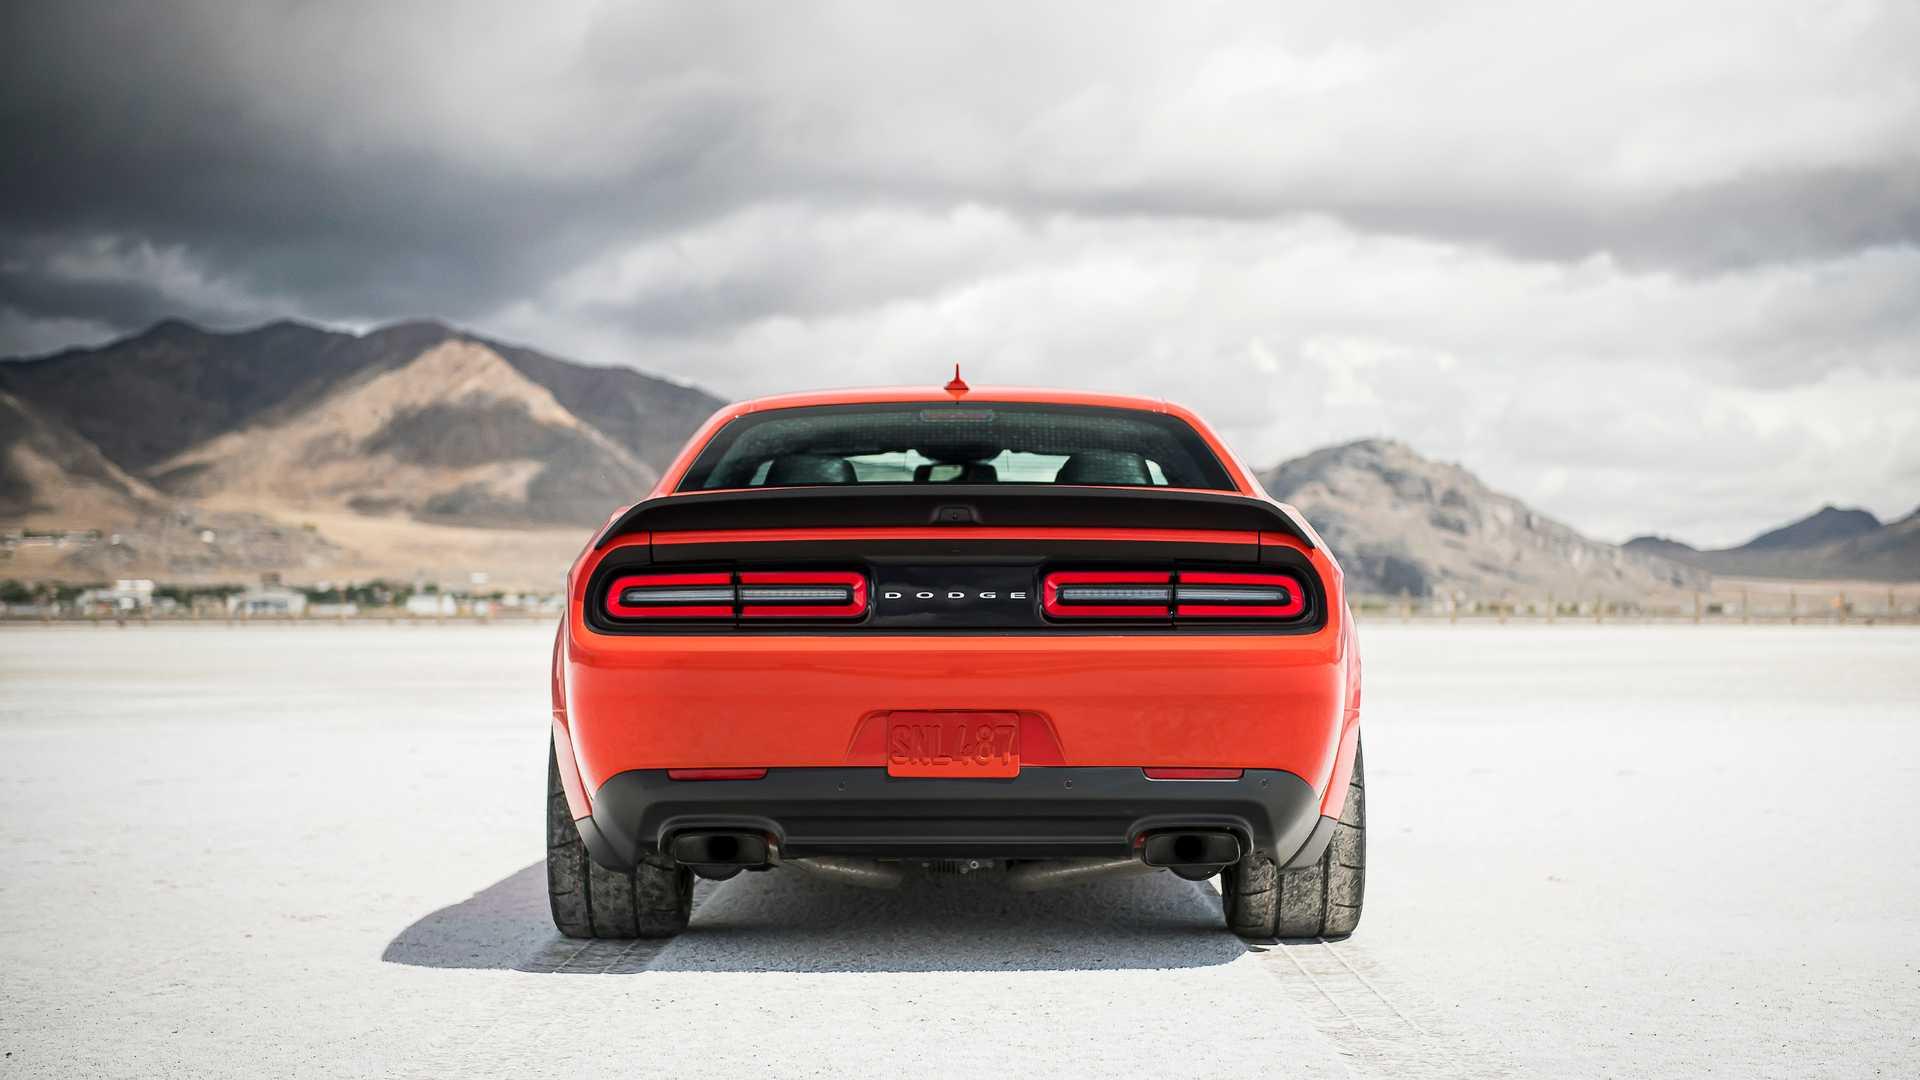 Kelebihan Kekurangan Chevrolet Dodge Top Model Tahun Ini